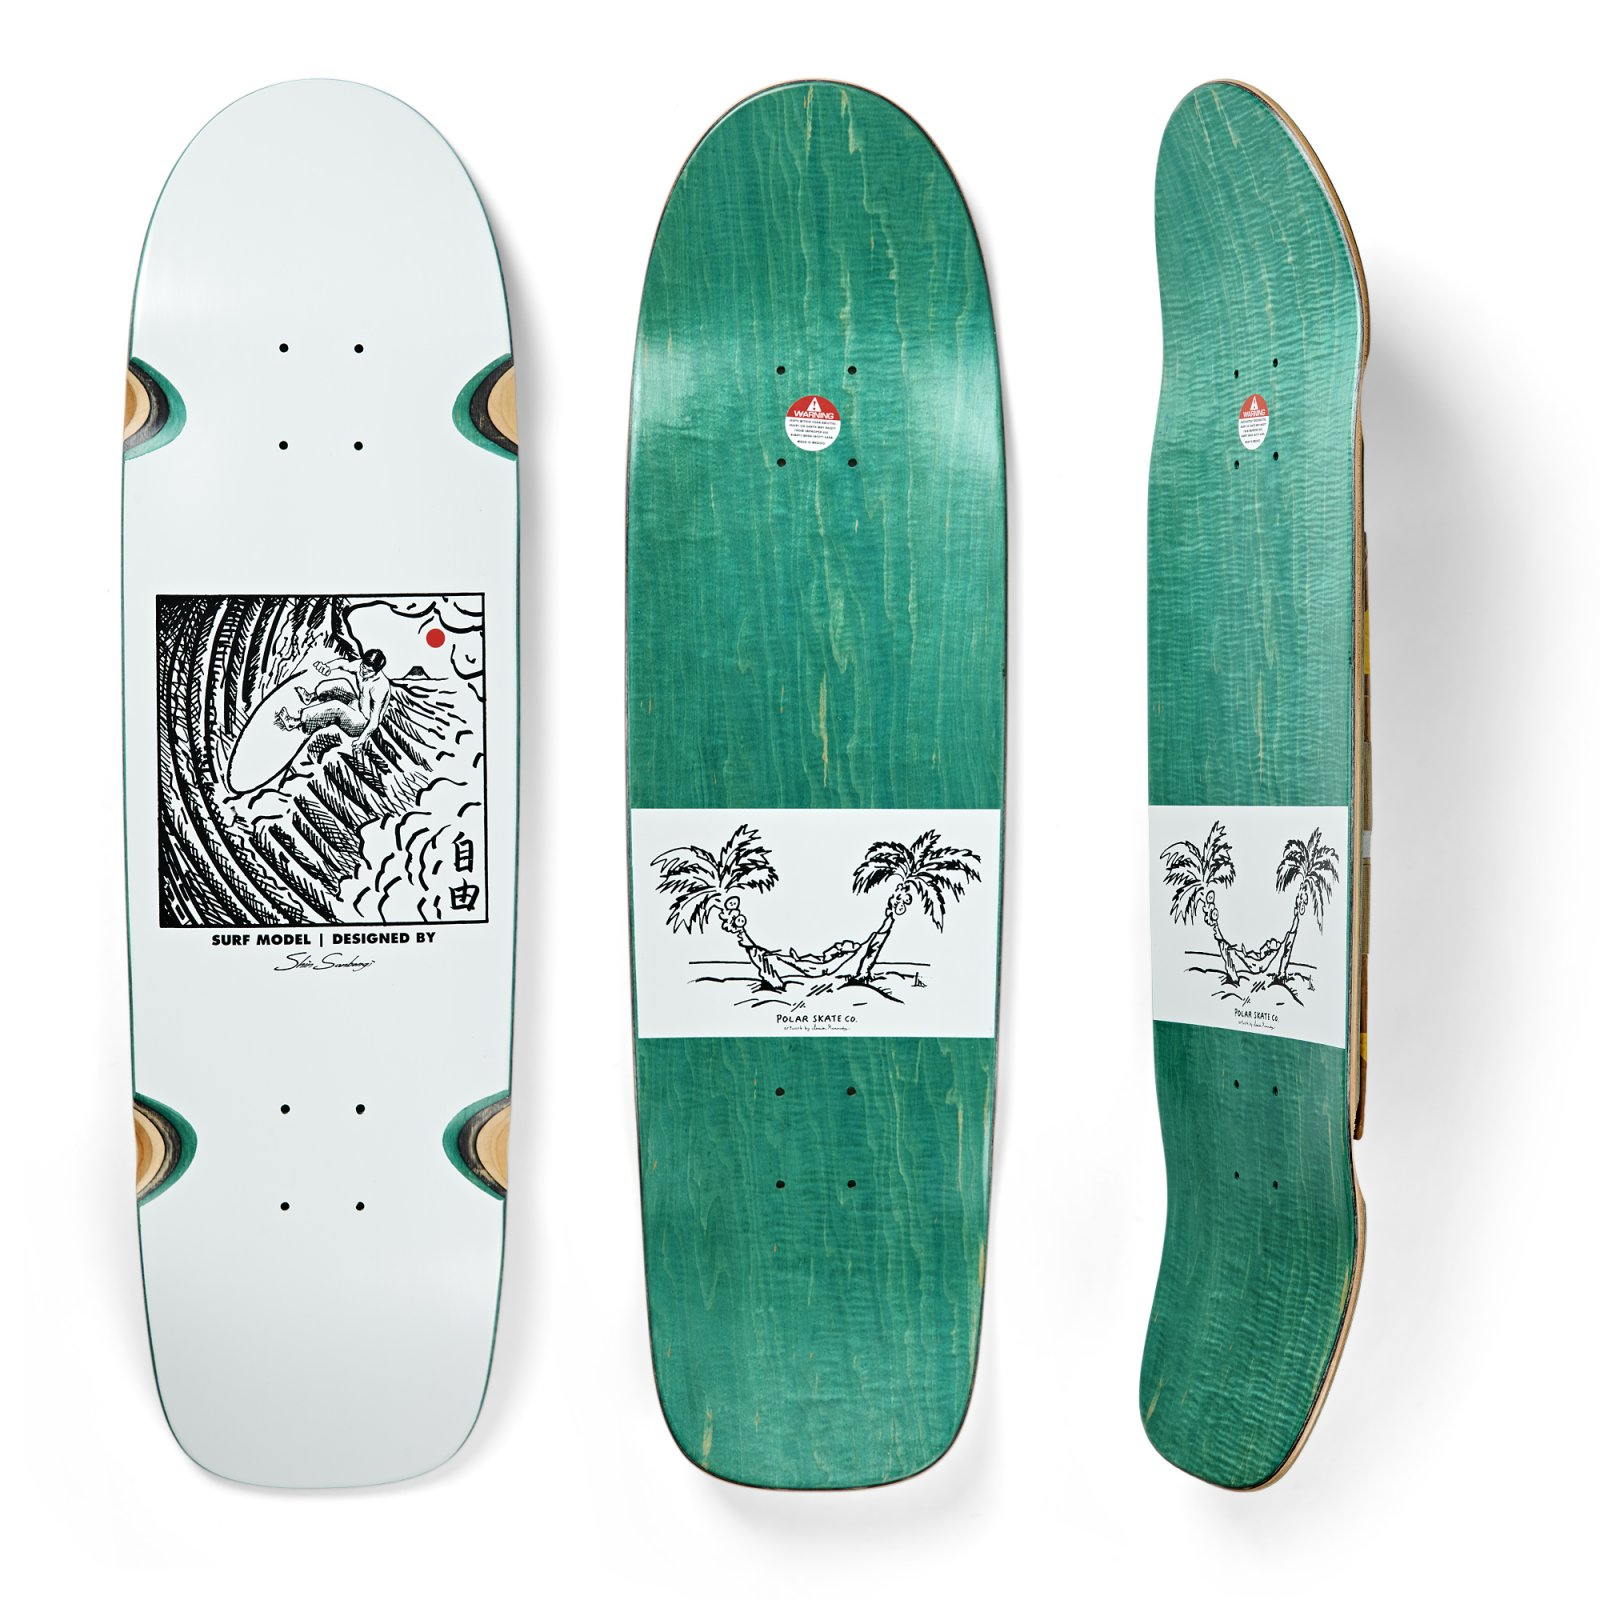 Polar Shin Sanbongi Freedom White Surf Jr 8.75 x 31.5